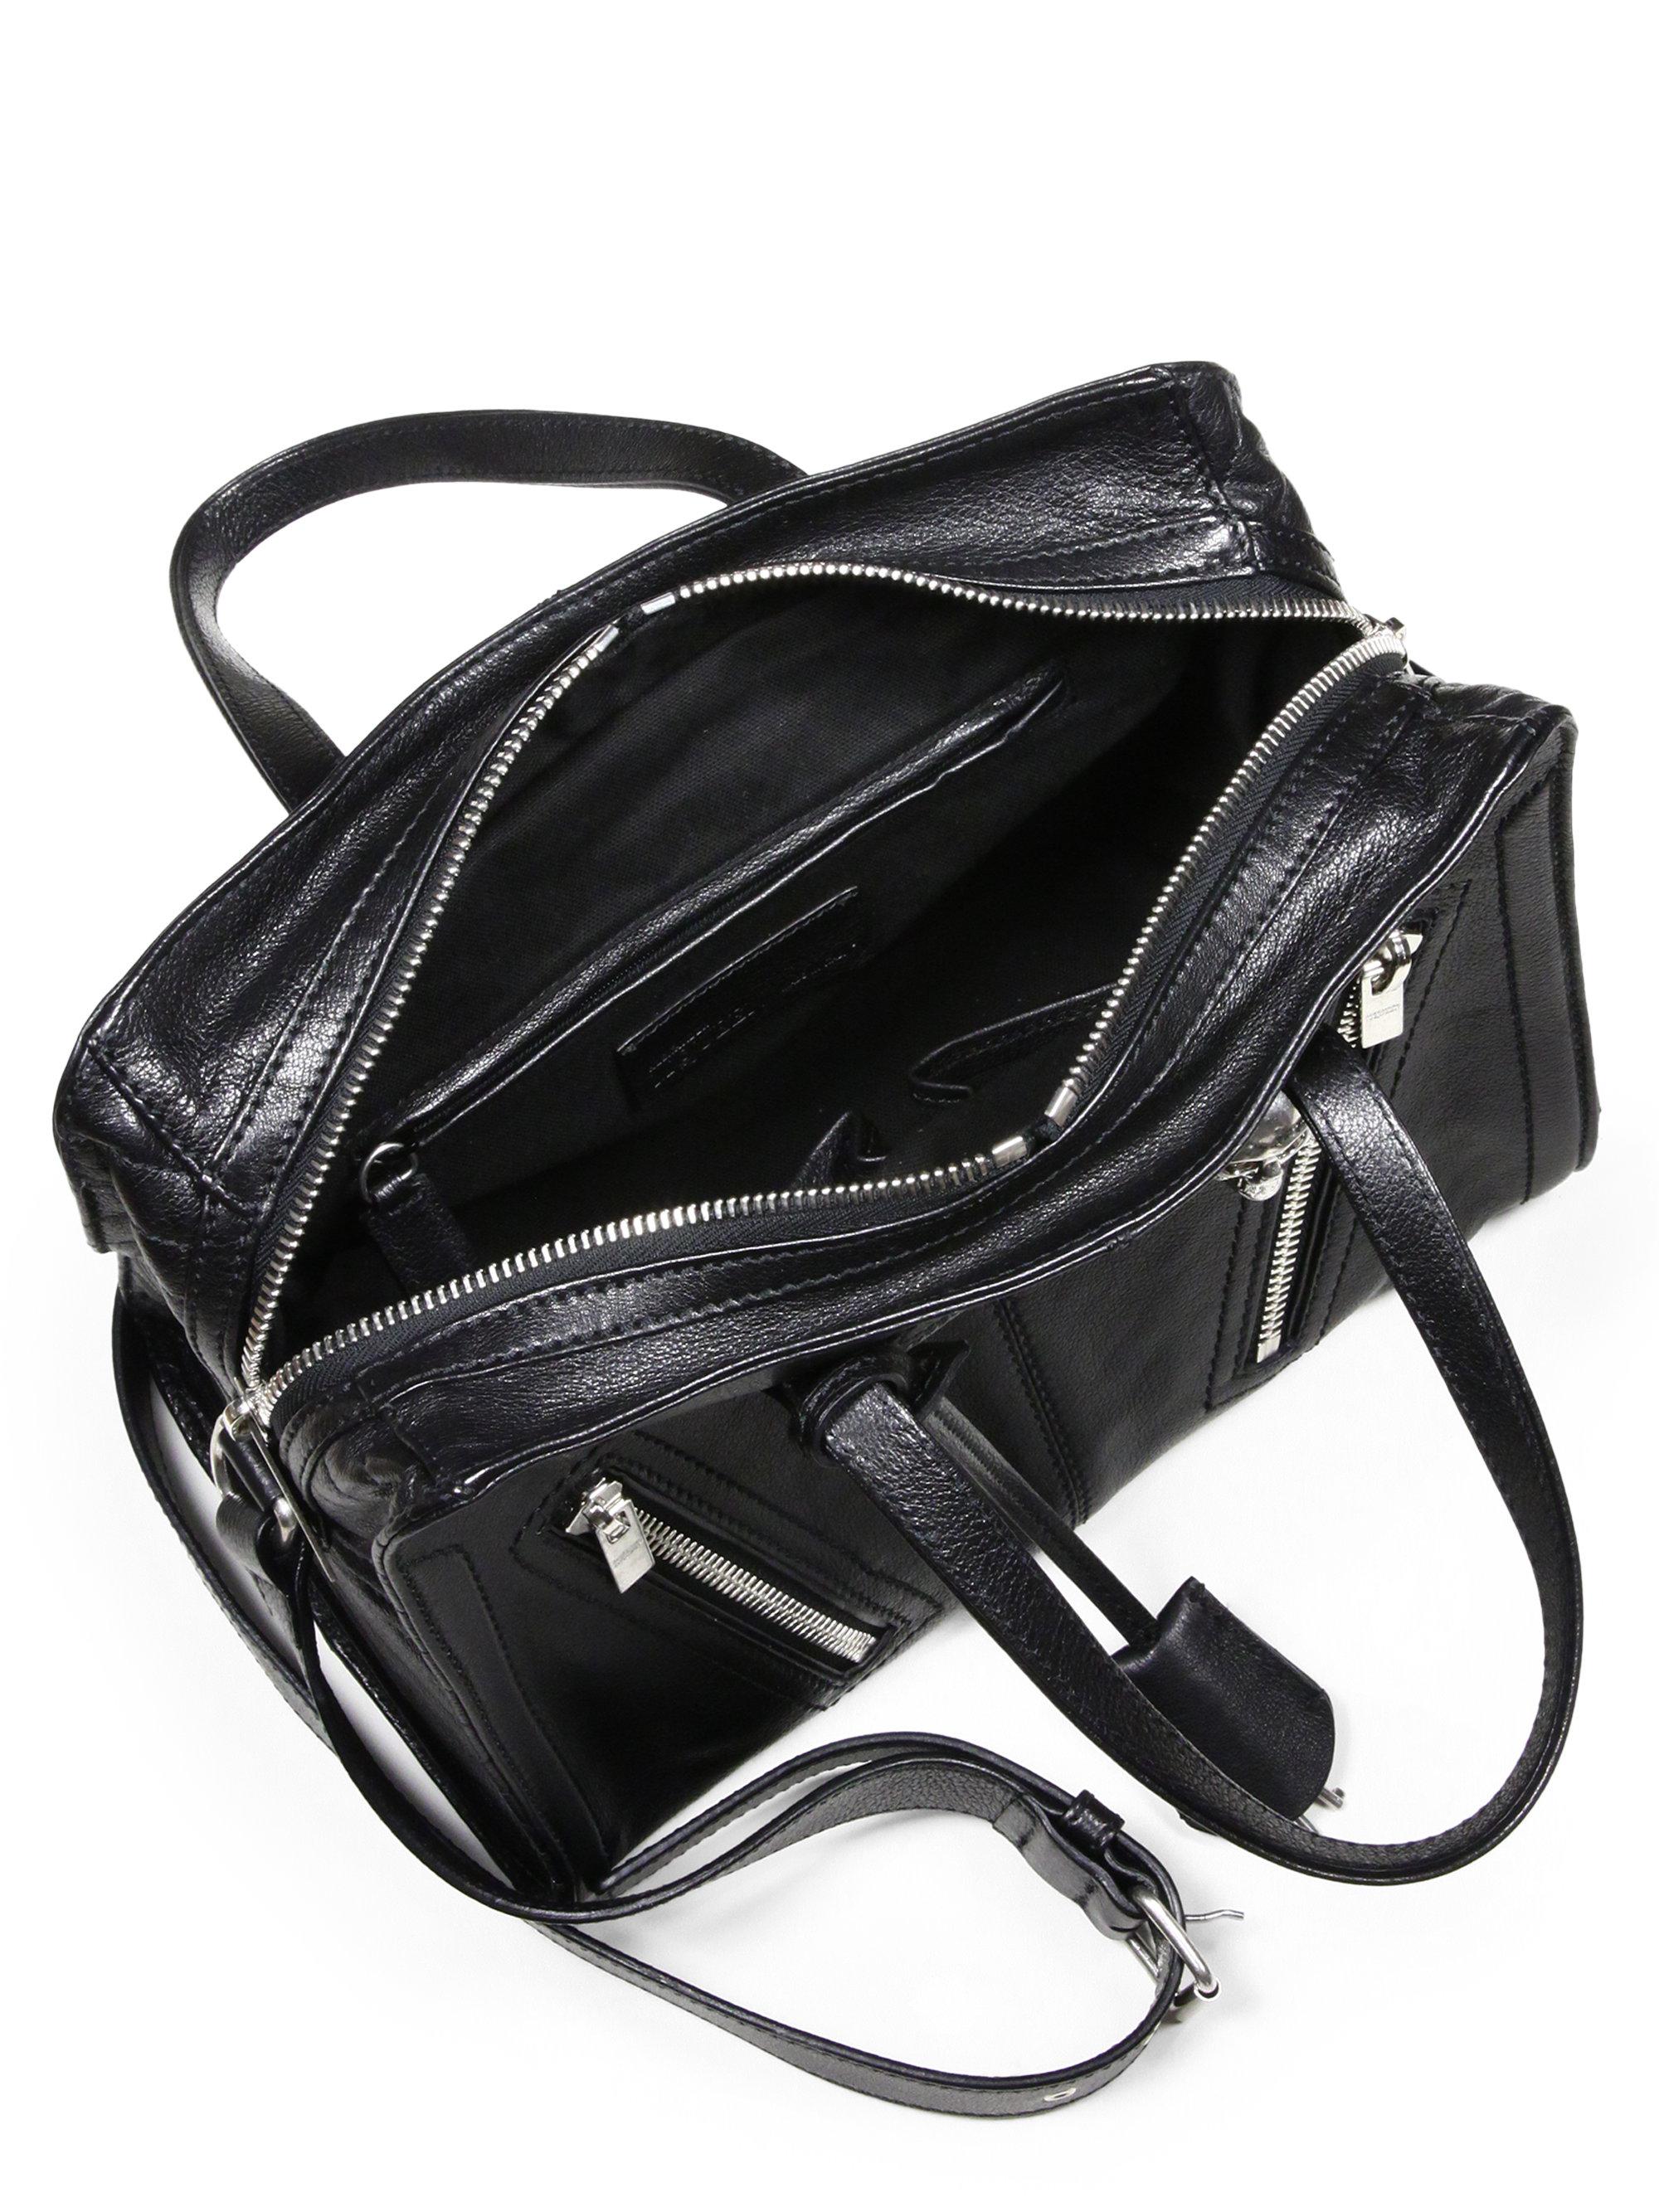 Monogram Small Zip-around Satchel Bag, Gray